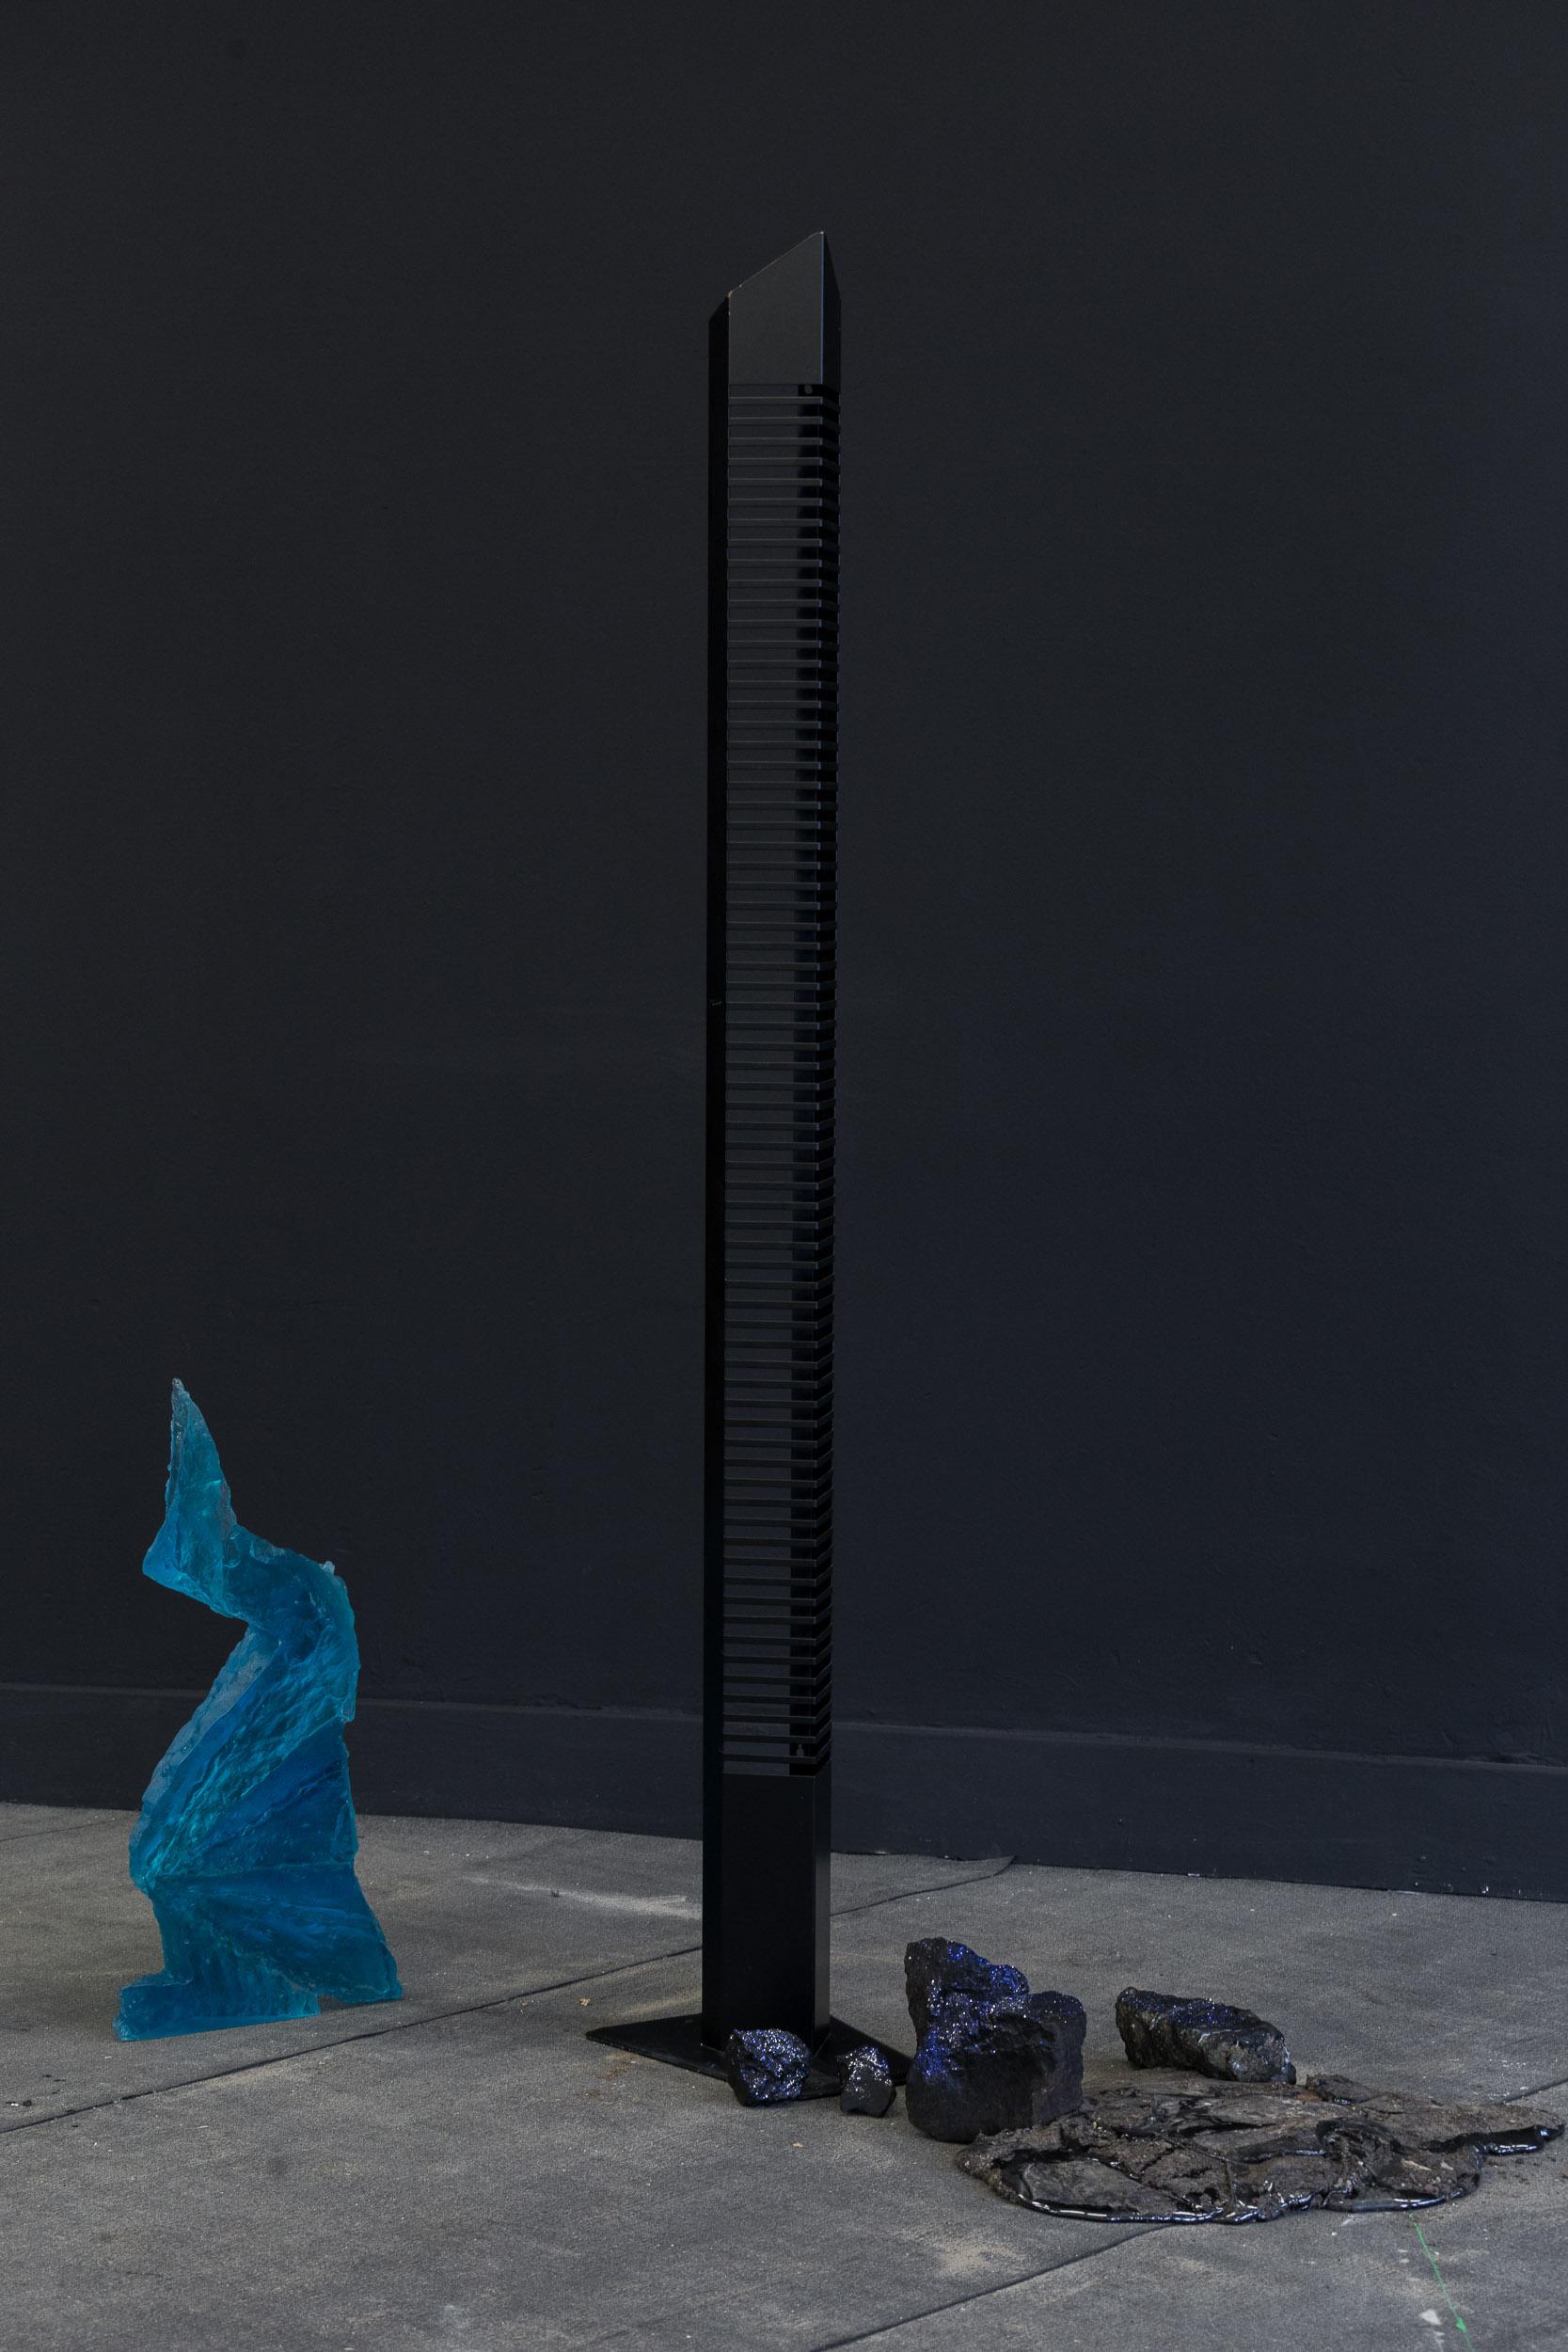 Matyas Chochola,    Monument of CD culture   , 2017, Mixed media installation, Dimension variable   Photo: Kilian Bannwart